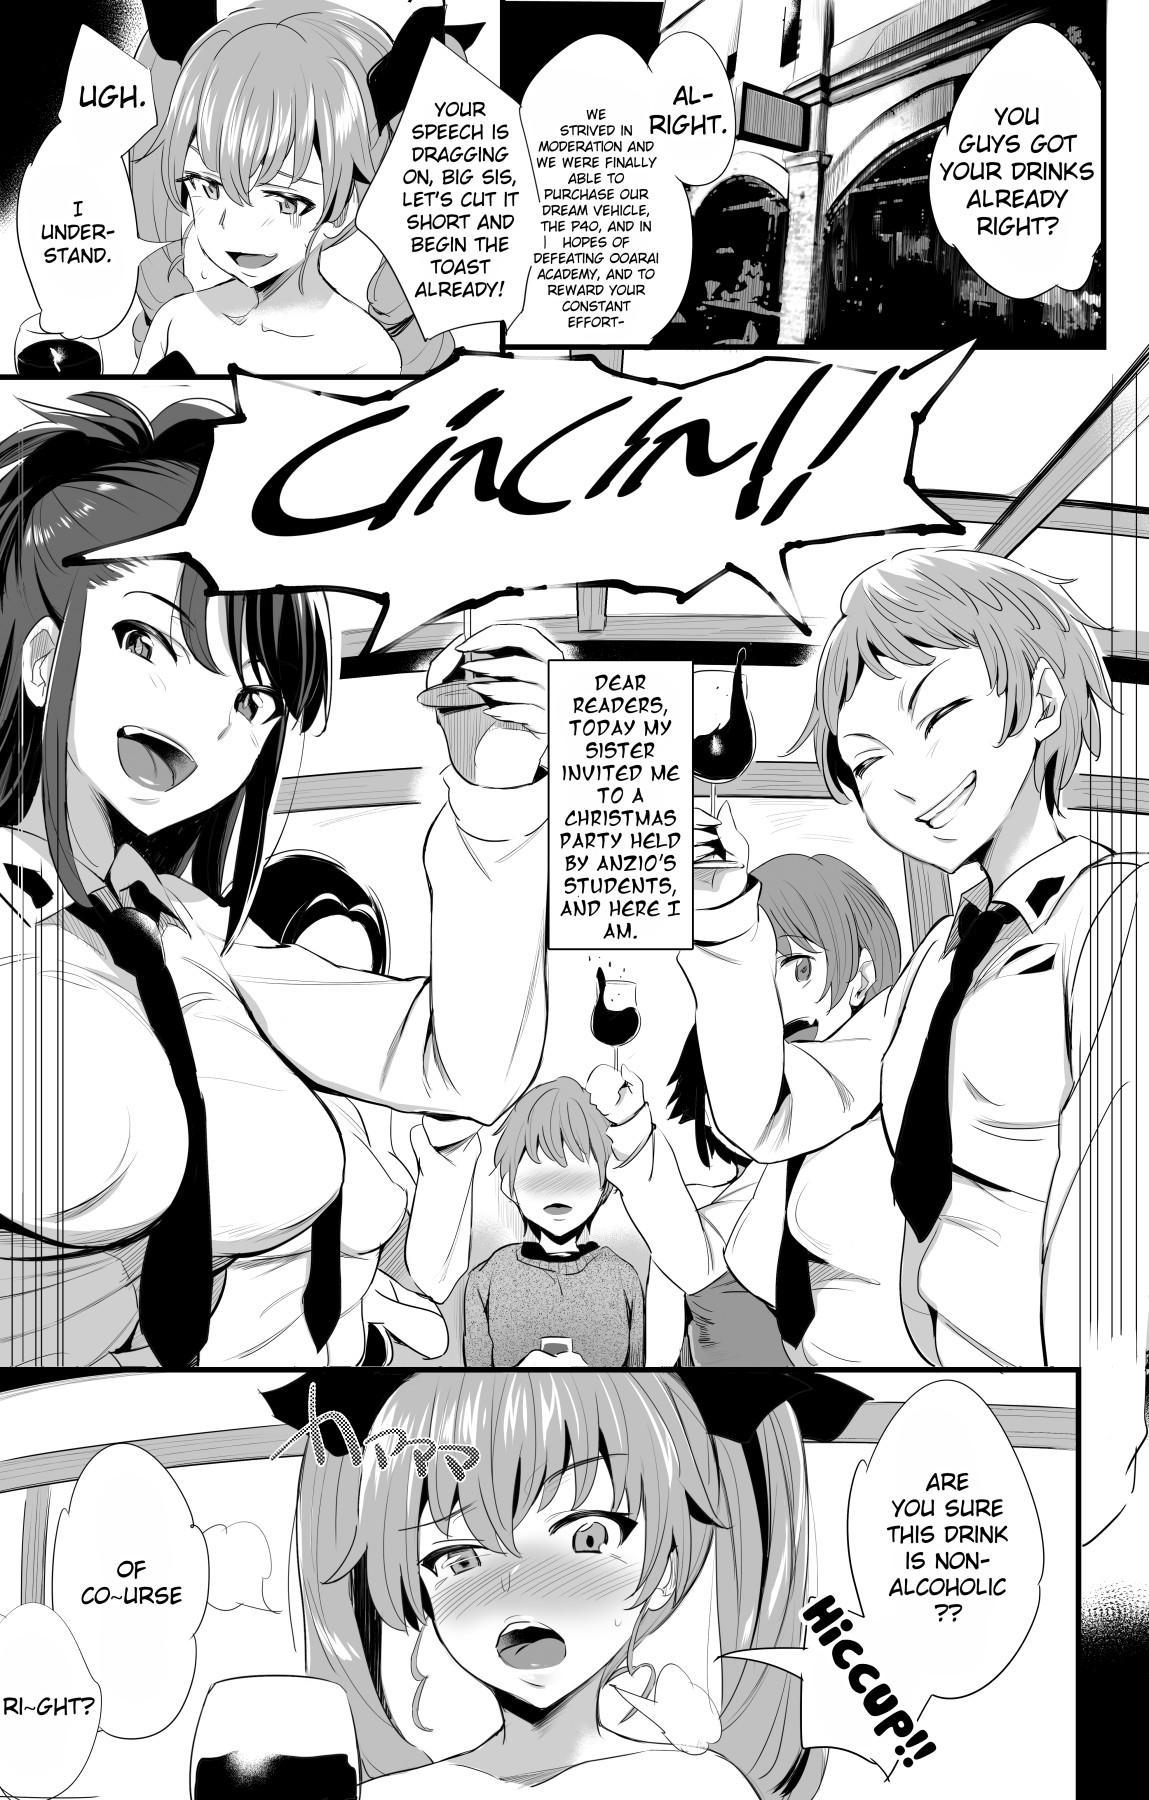 [Jack to Nicholson (NoriPachi)] Anzio-ryuu 4-shu no Onee-chan Sakusen | Anzio Style-4 Varieties of Sister Attacks (Girls und Panzer) [English] {Doujins.com} [Digital] 1